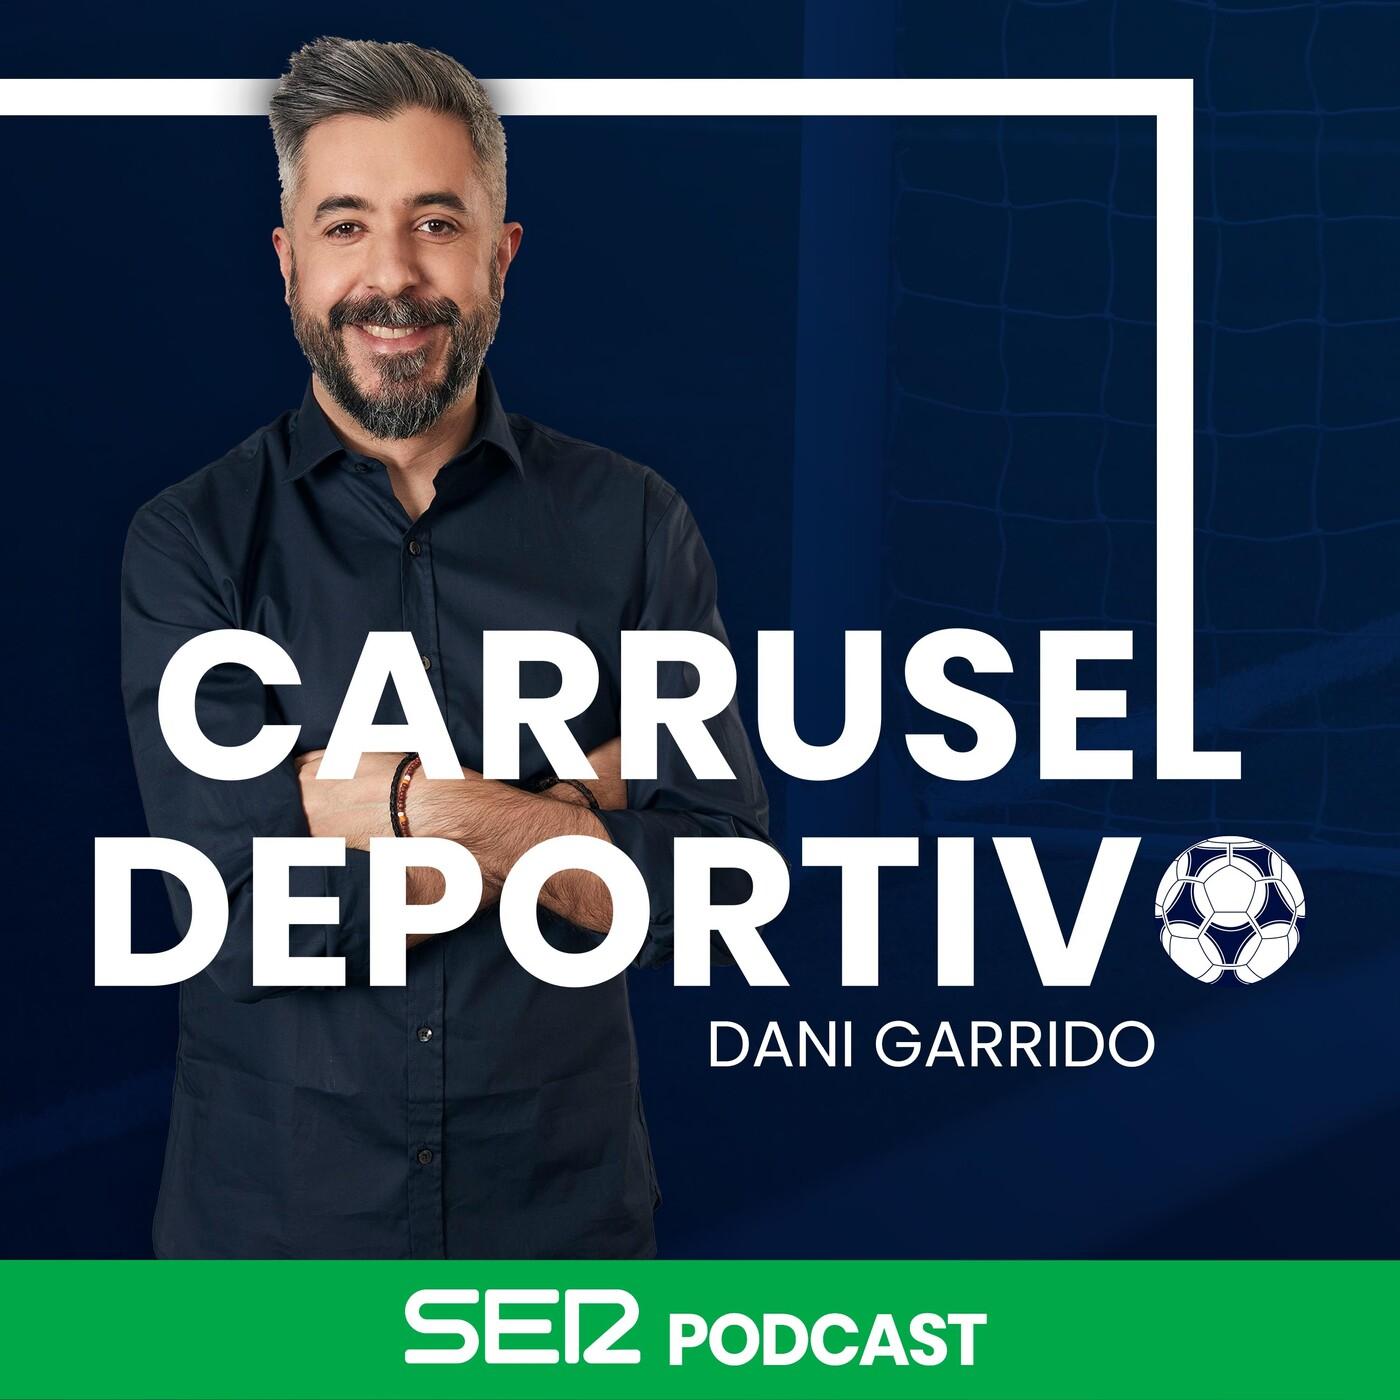 Carrusel Deportivo (23/02/2020 - Tramo de 23:00 a 23:30)